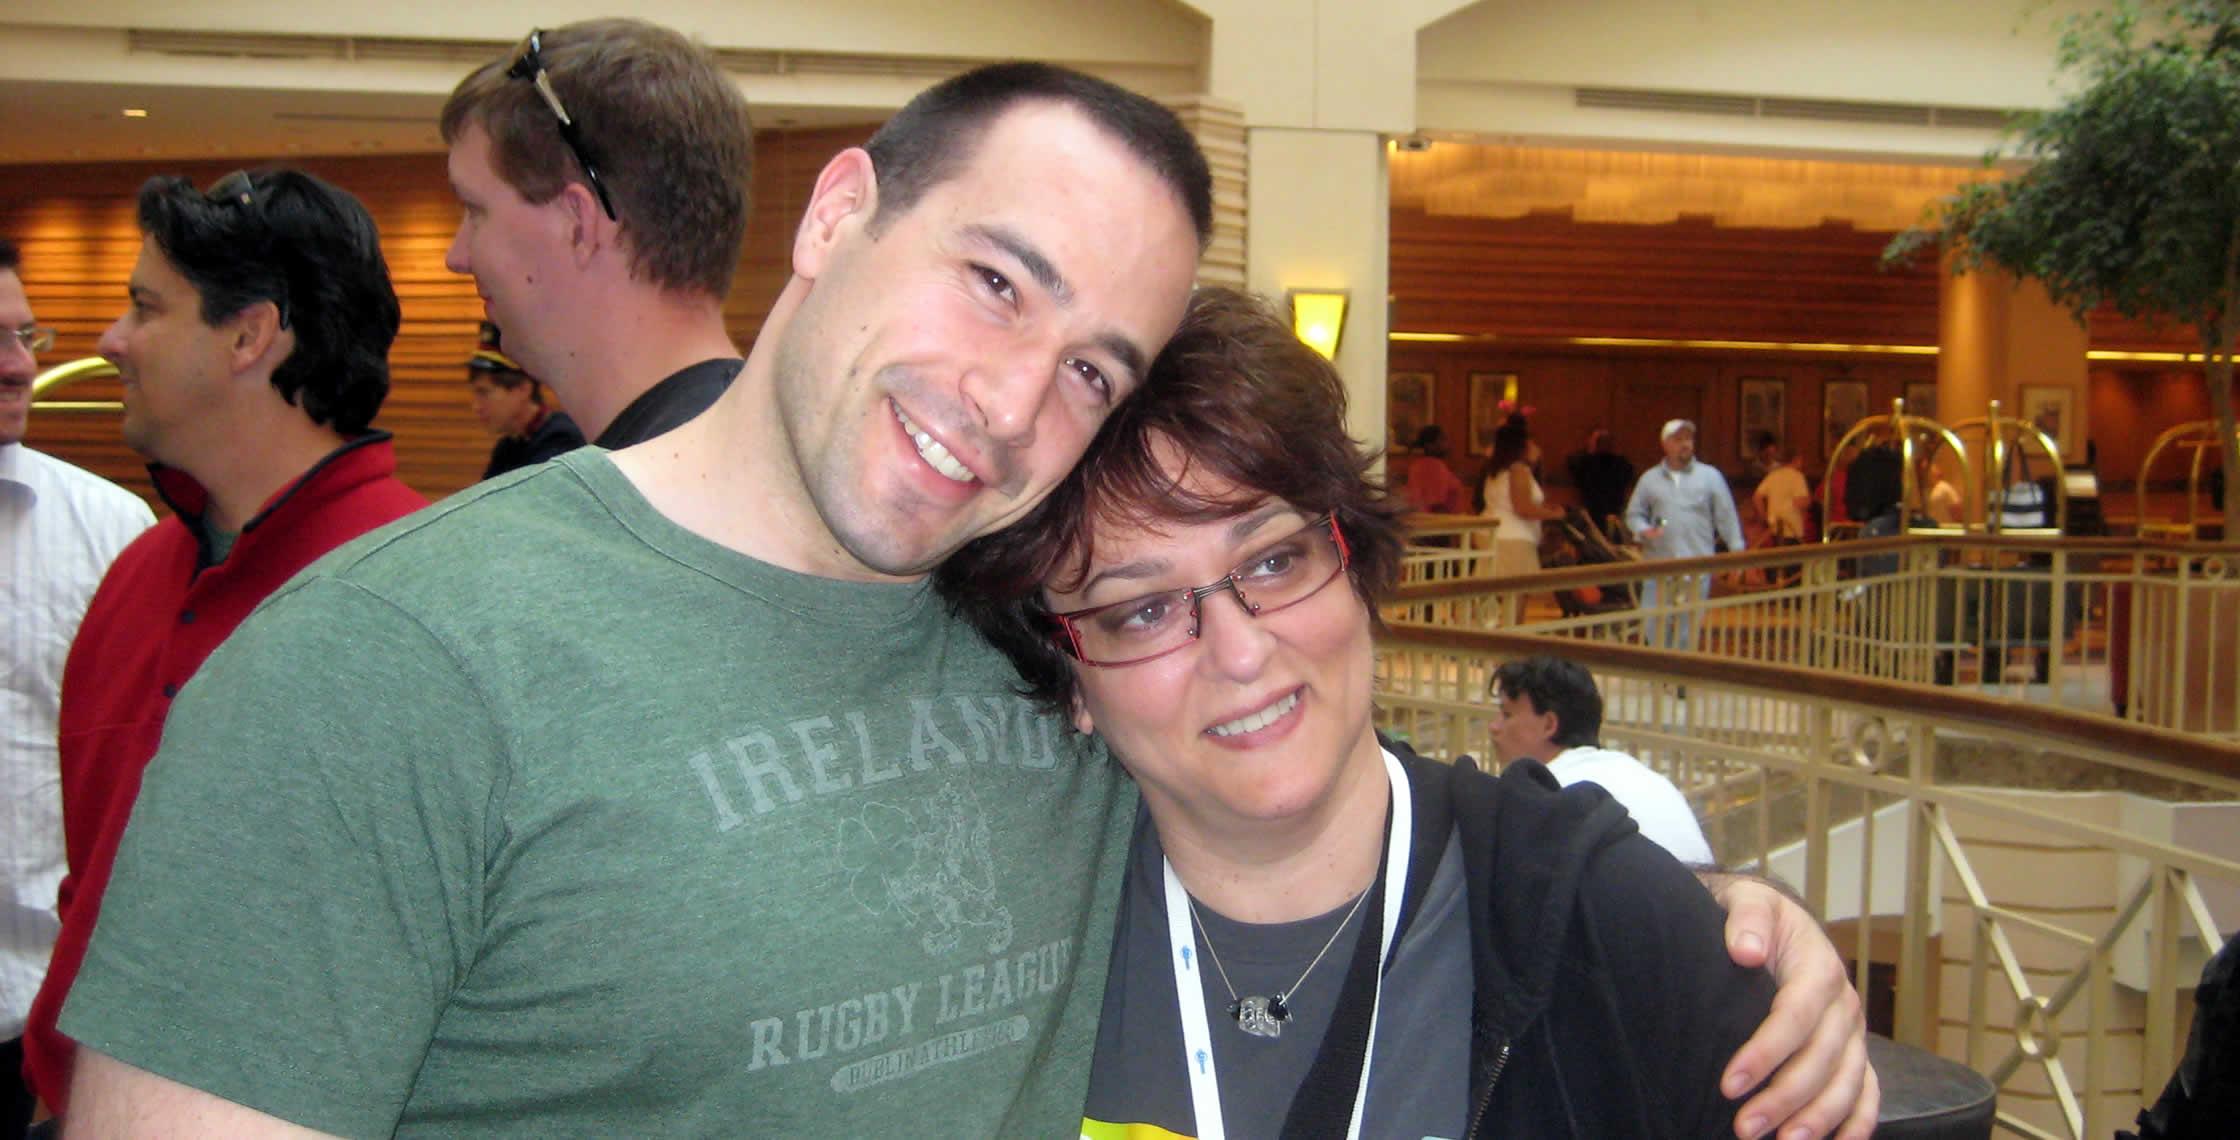 Ben Nadel at CFUNITED 2008 (Washington, D.C.) with: Dee Sadler